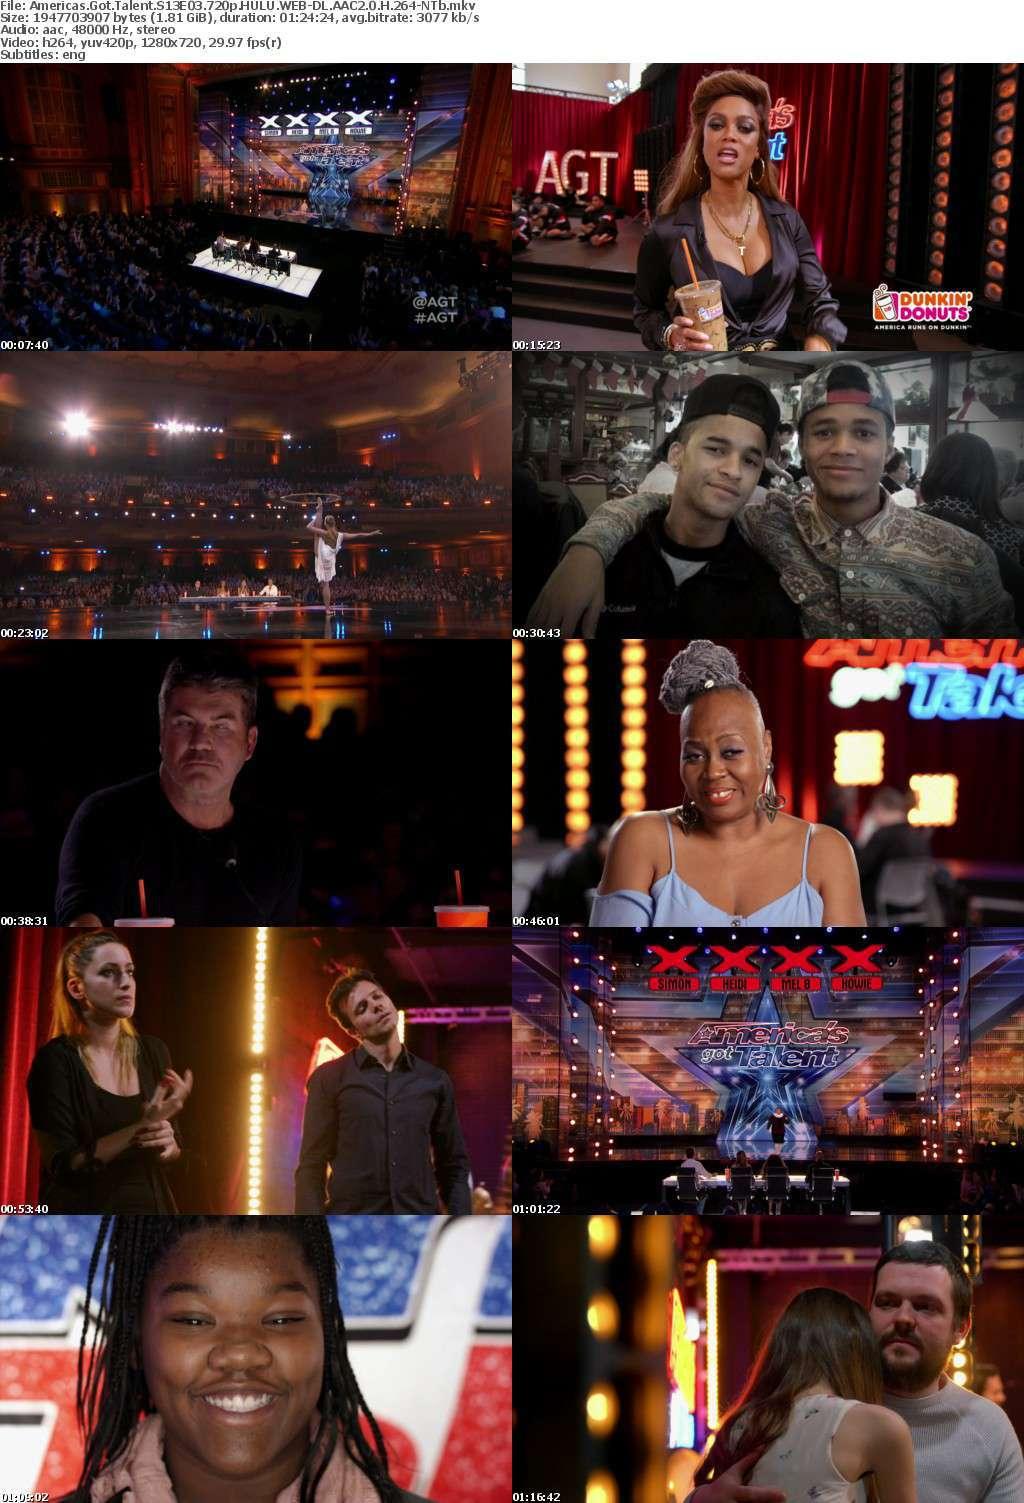 Americas Got Talent S13E03 720p HULU WEB-DL AAC2 0 H 264-NTb